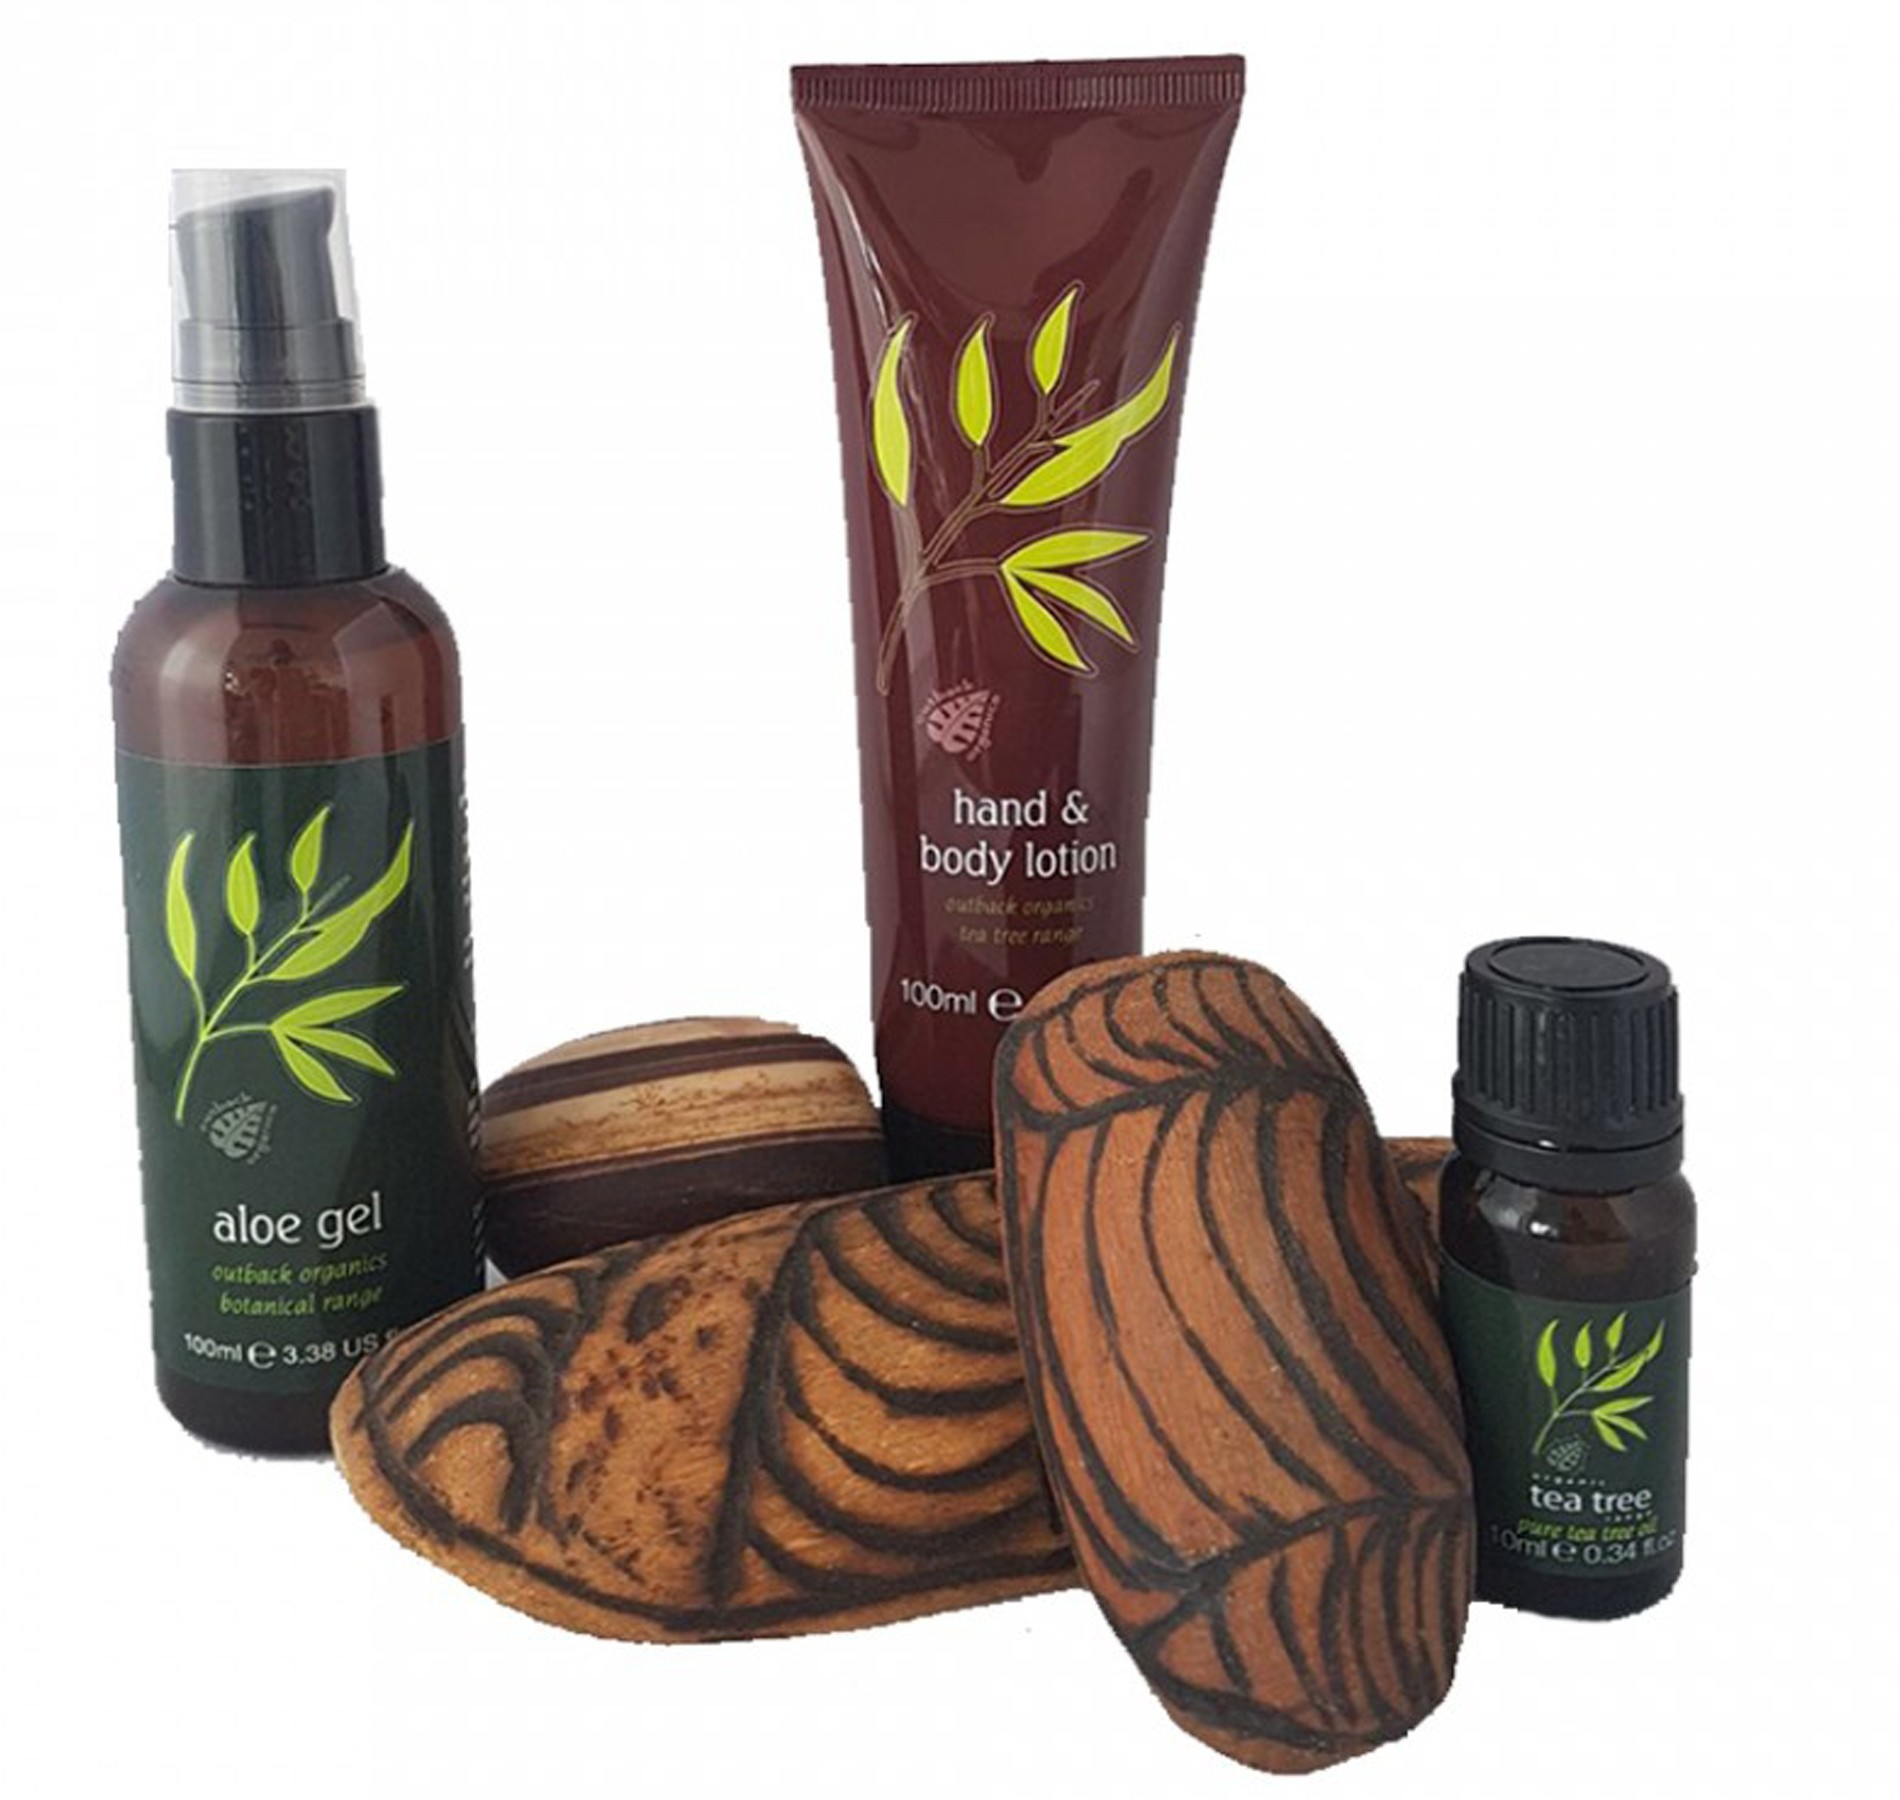 Outback Organics Soothing Aloe Vera & Tea Tree Body Set